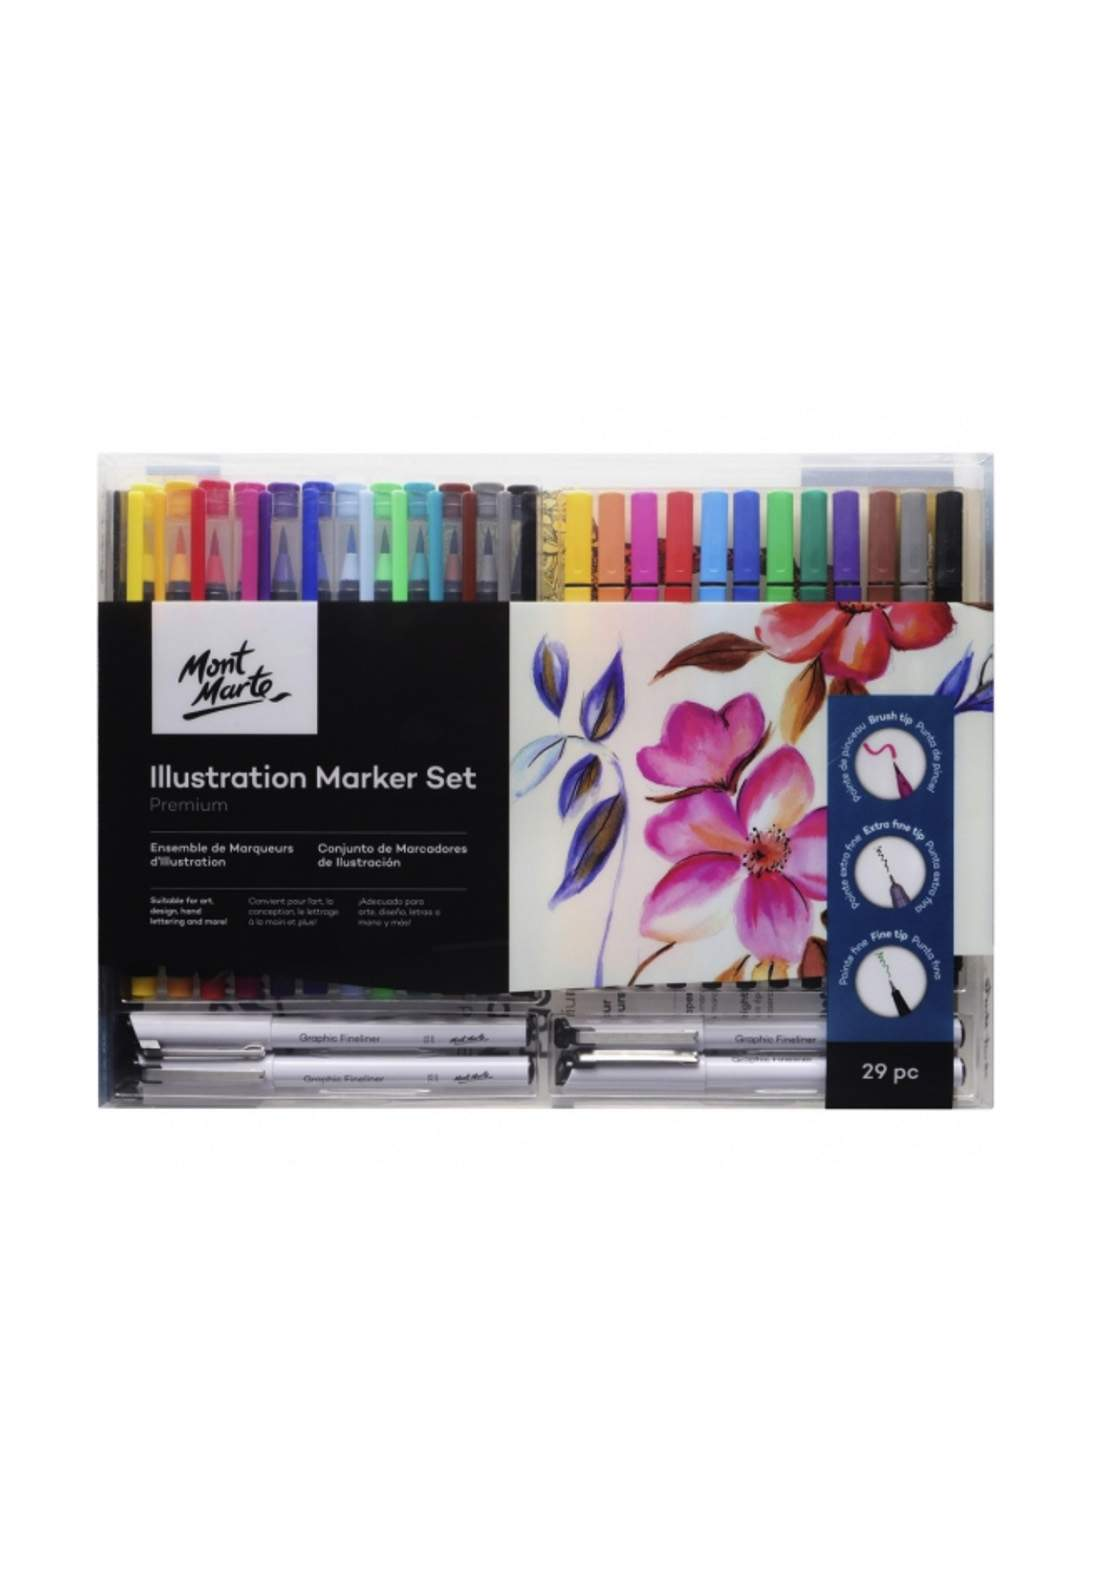 Premium Illustration Marker Set 29 pc- اقلام تلوين 29 لون